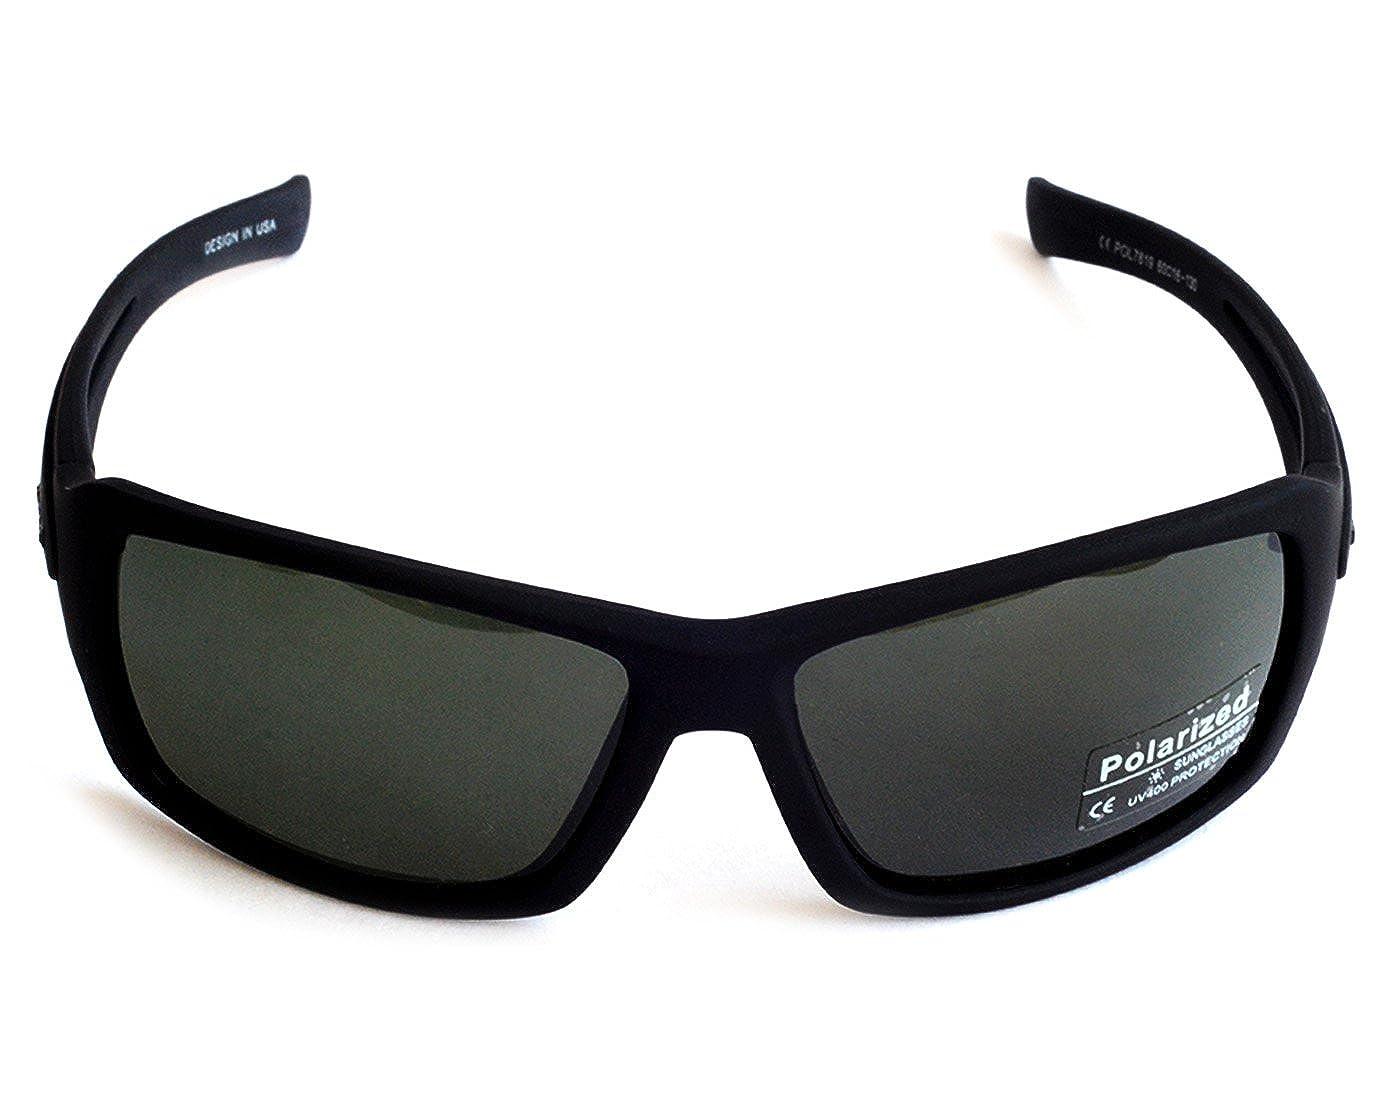 940bbf082e8 Magiq rectanglular black polarised braveheart sunglass clothing accessories  jpg 1400x1100 Braveheart sunglasses